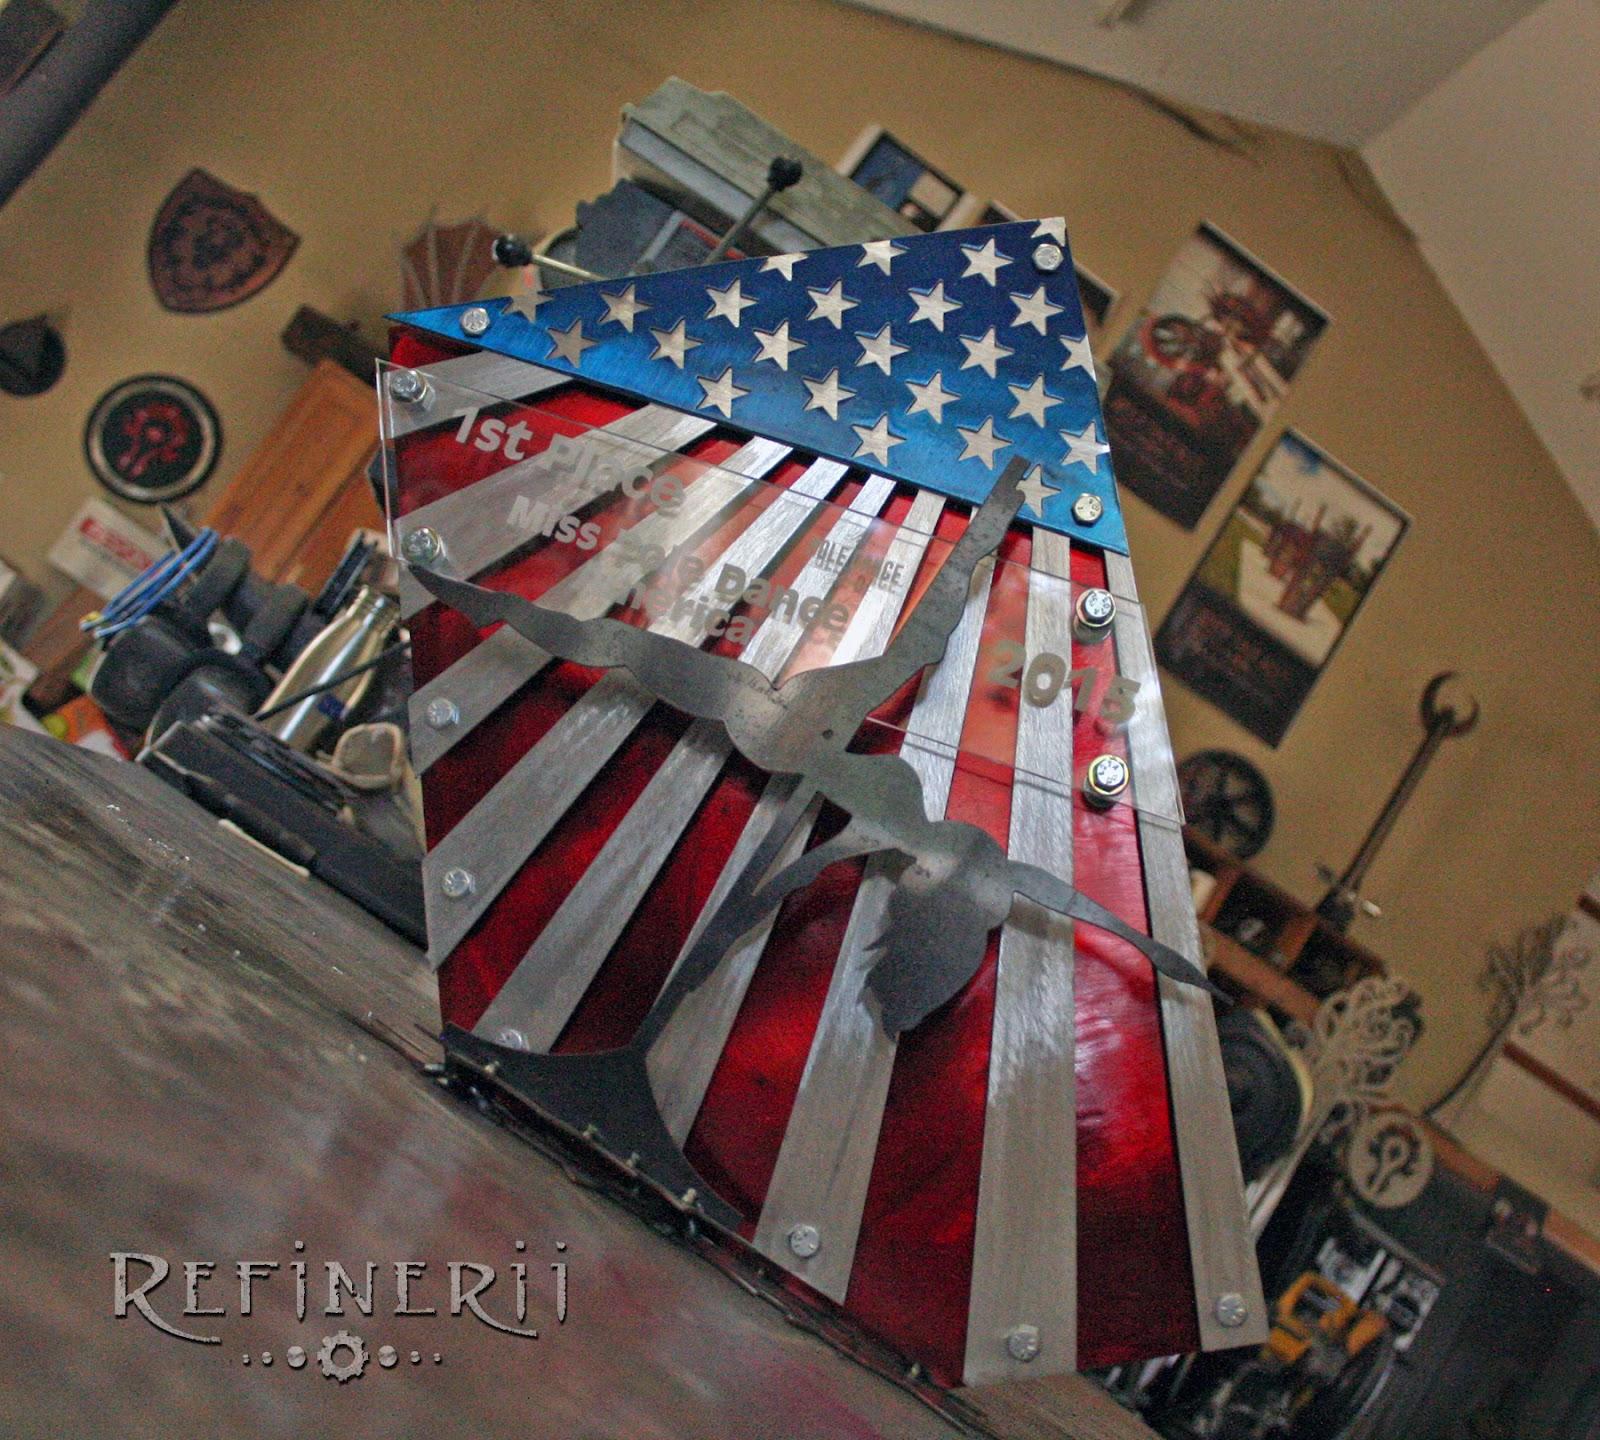 custom trophy, custom award, Miss Pole Dance America, american flag, metal, metal art, metal work, award